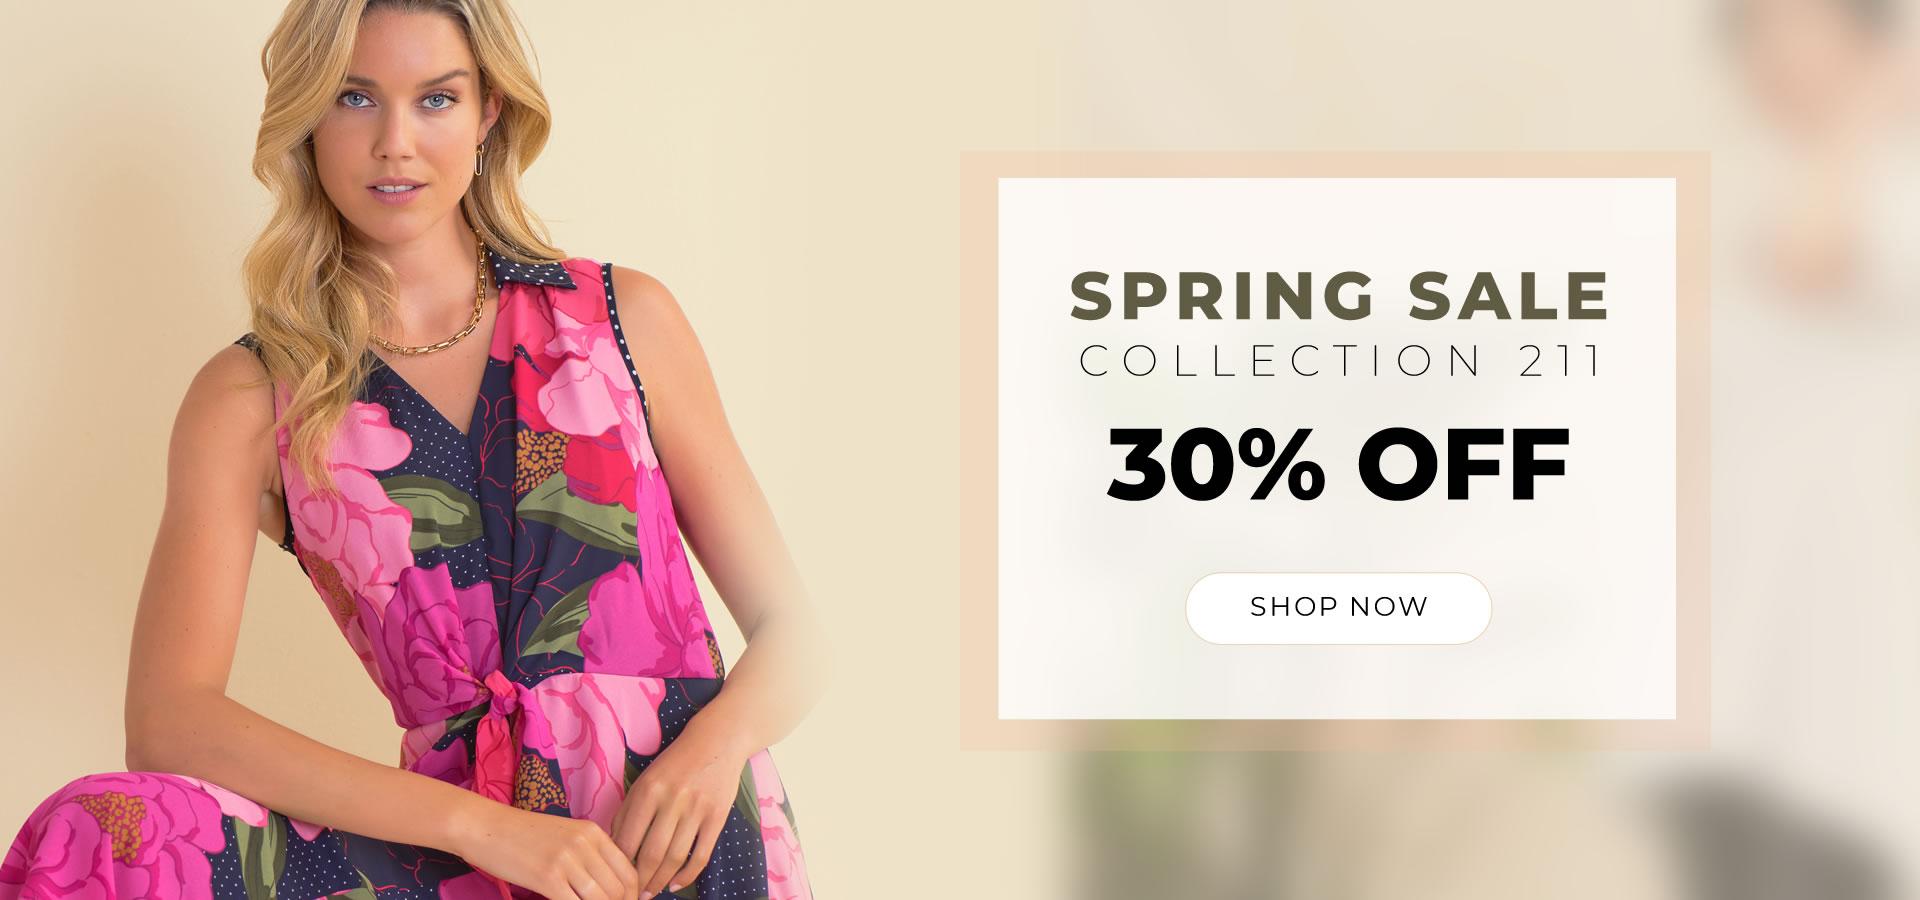 Joseph Ribkoff Spring Sale - 30% off